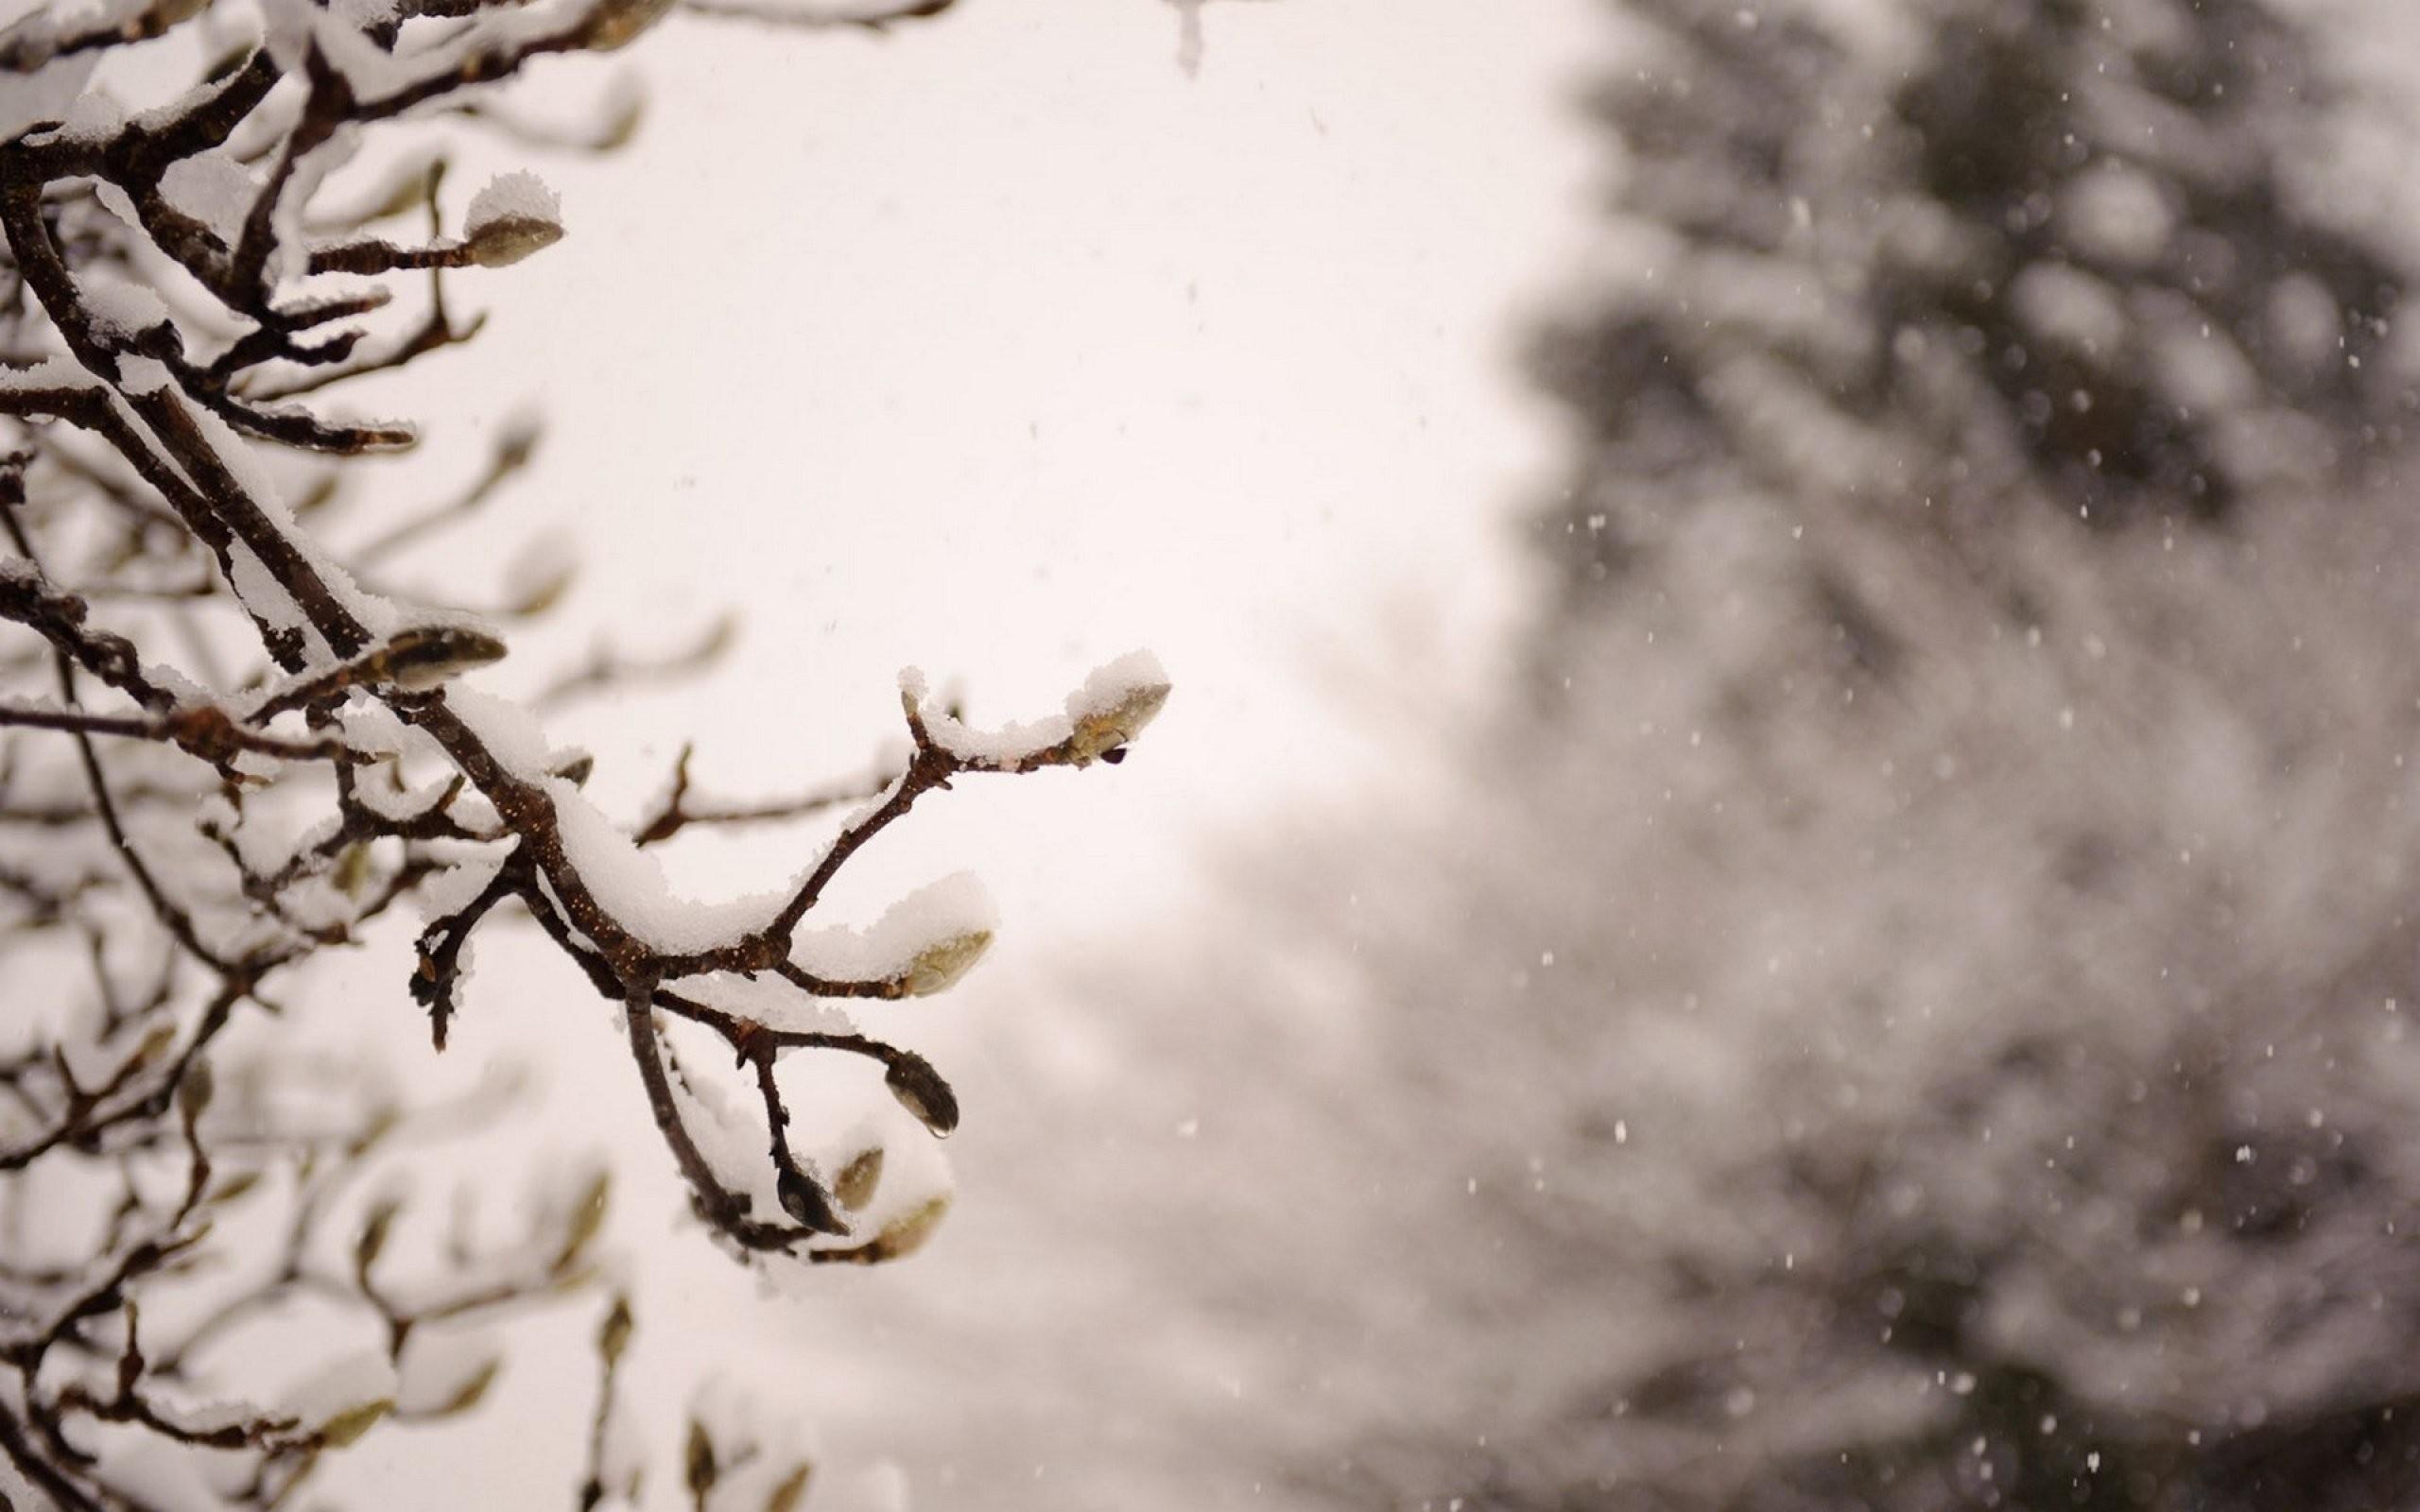 Japan nature winter snow trees wallpaper | | 417234 | WallpaperUP